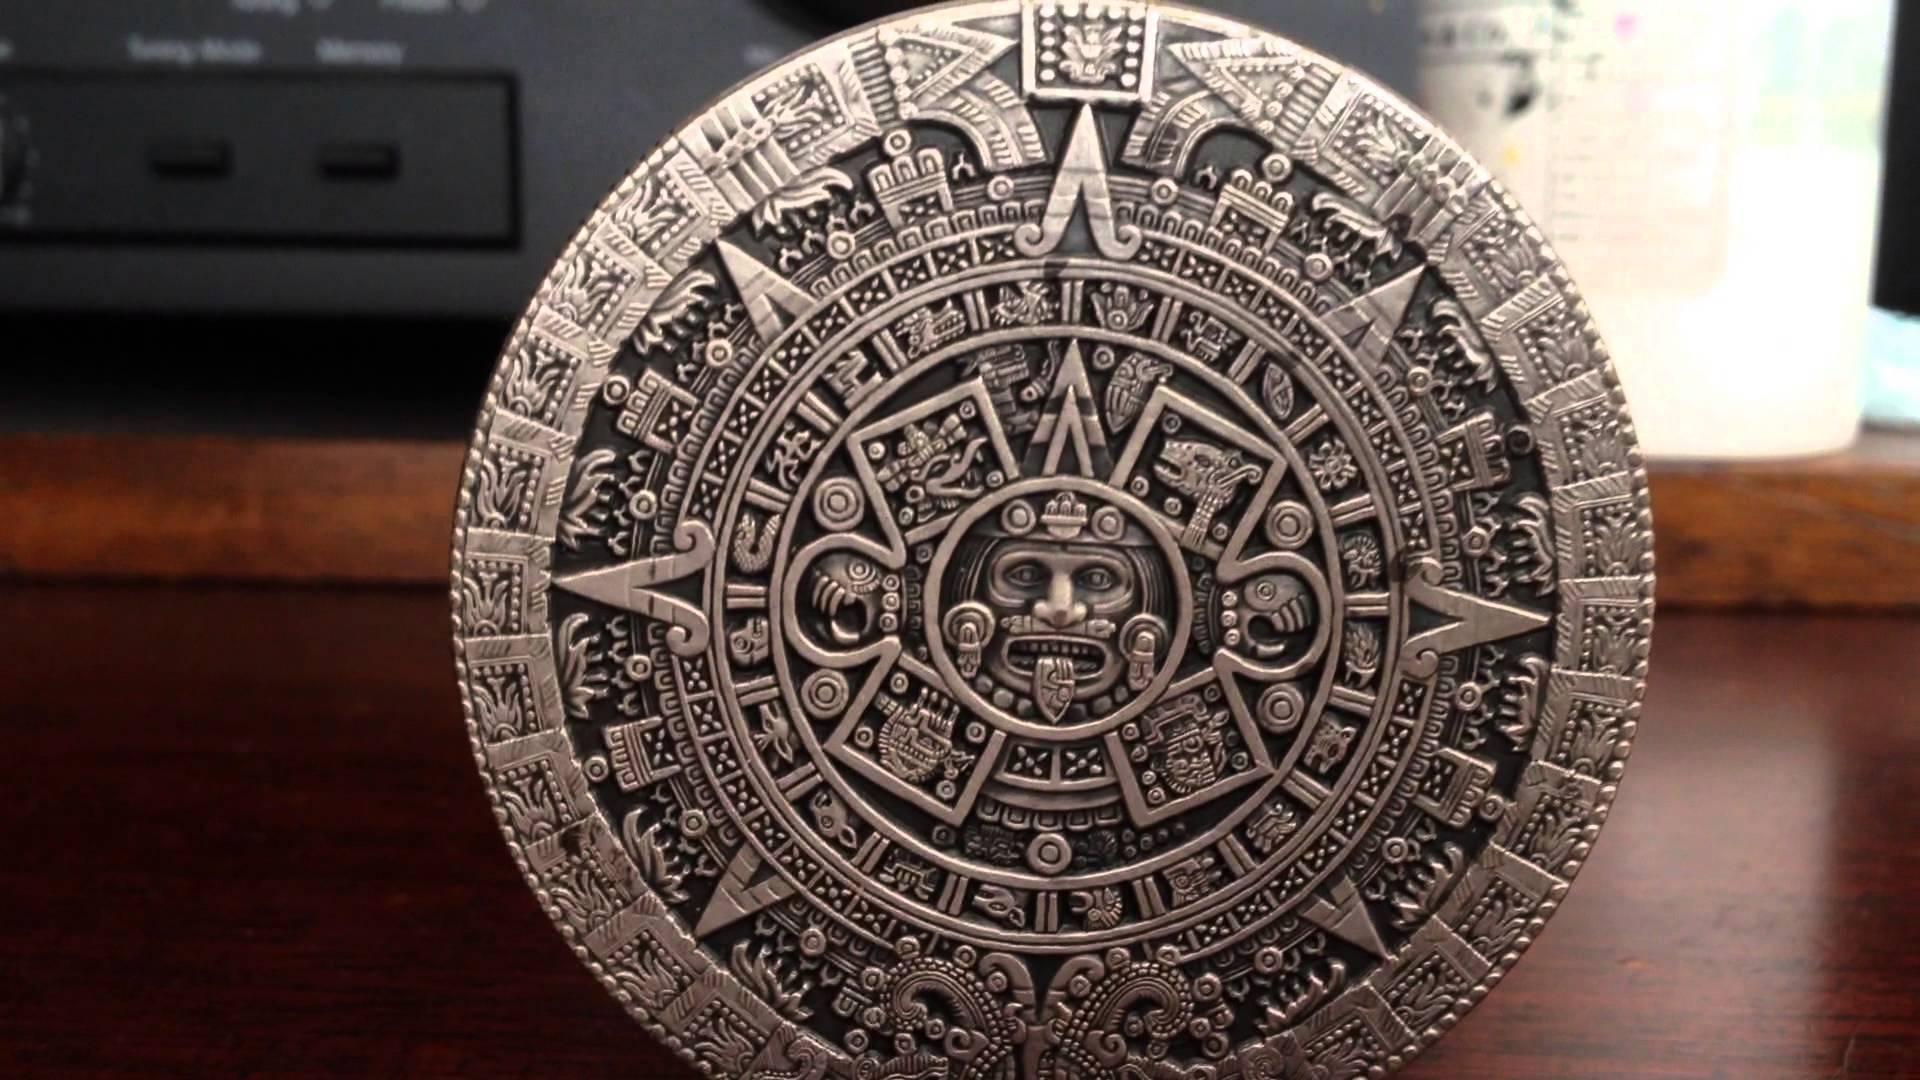 Hd Wallpapers 1080p Widescreen Quotes Download Free Aztec Calendar Wallpaper Pixelstalk Net